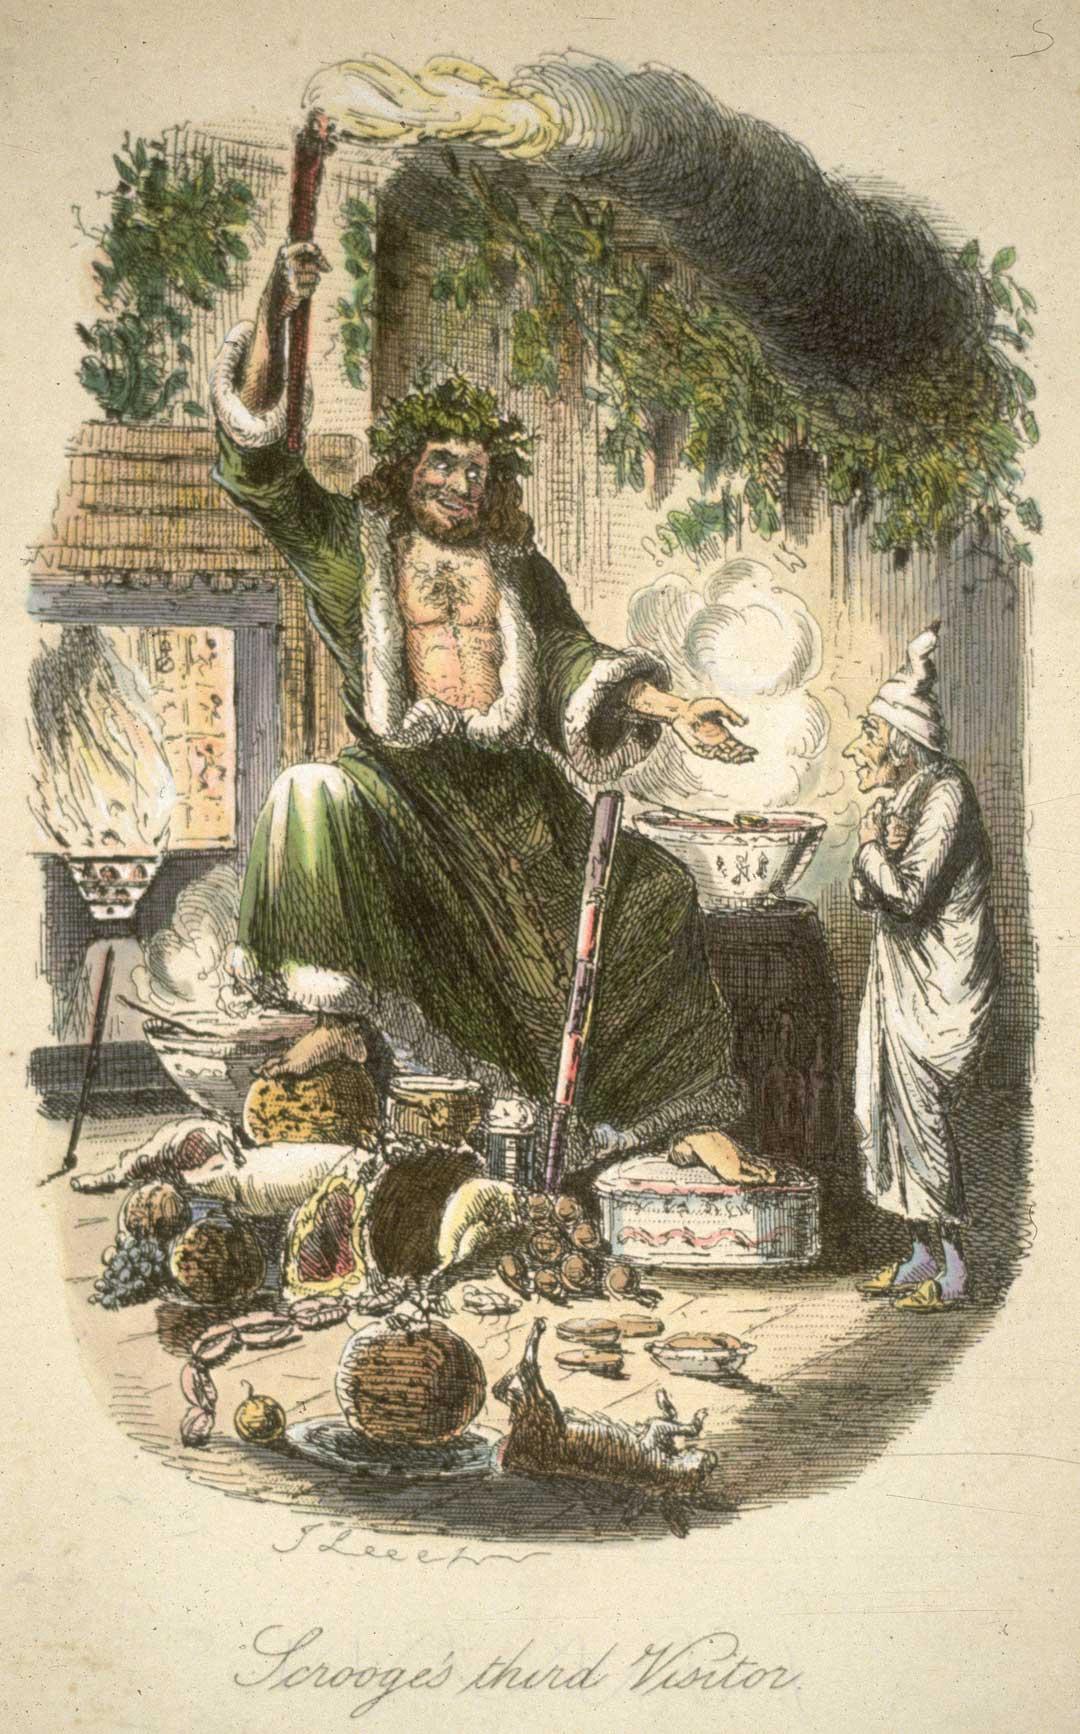 School Radio - A Christmas Carol, 5: The second of the three spirits